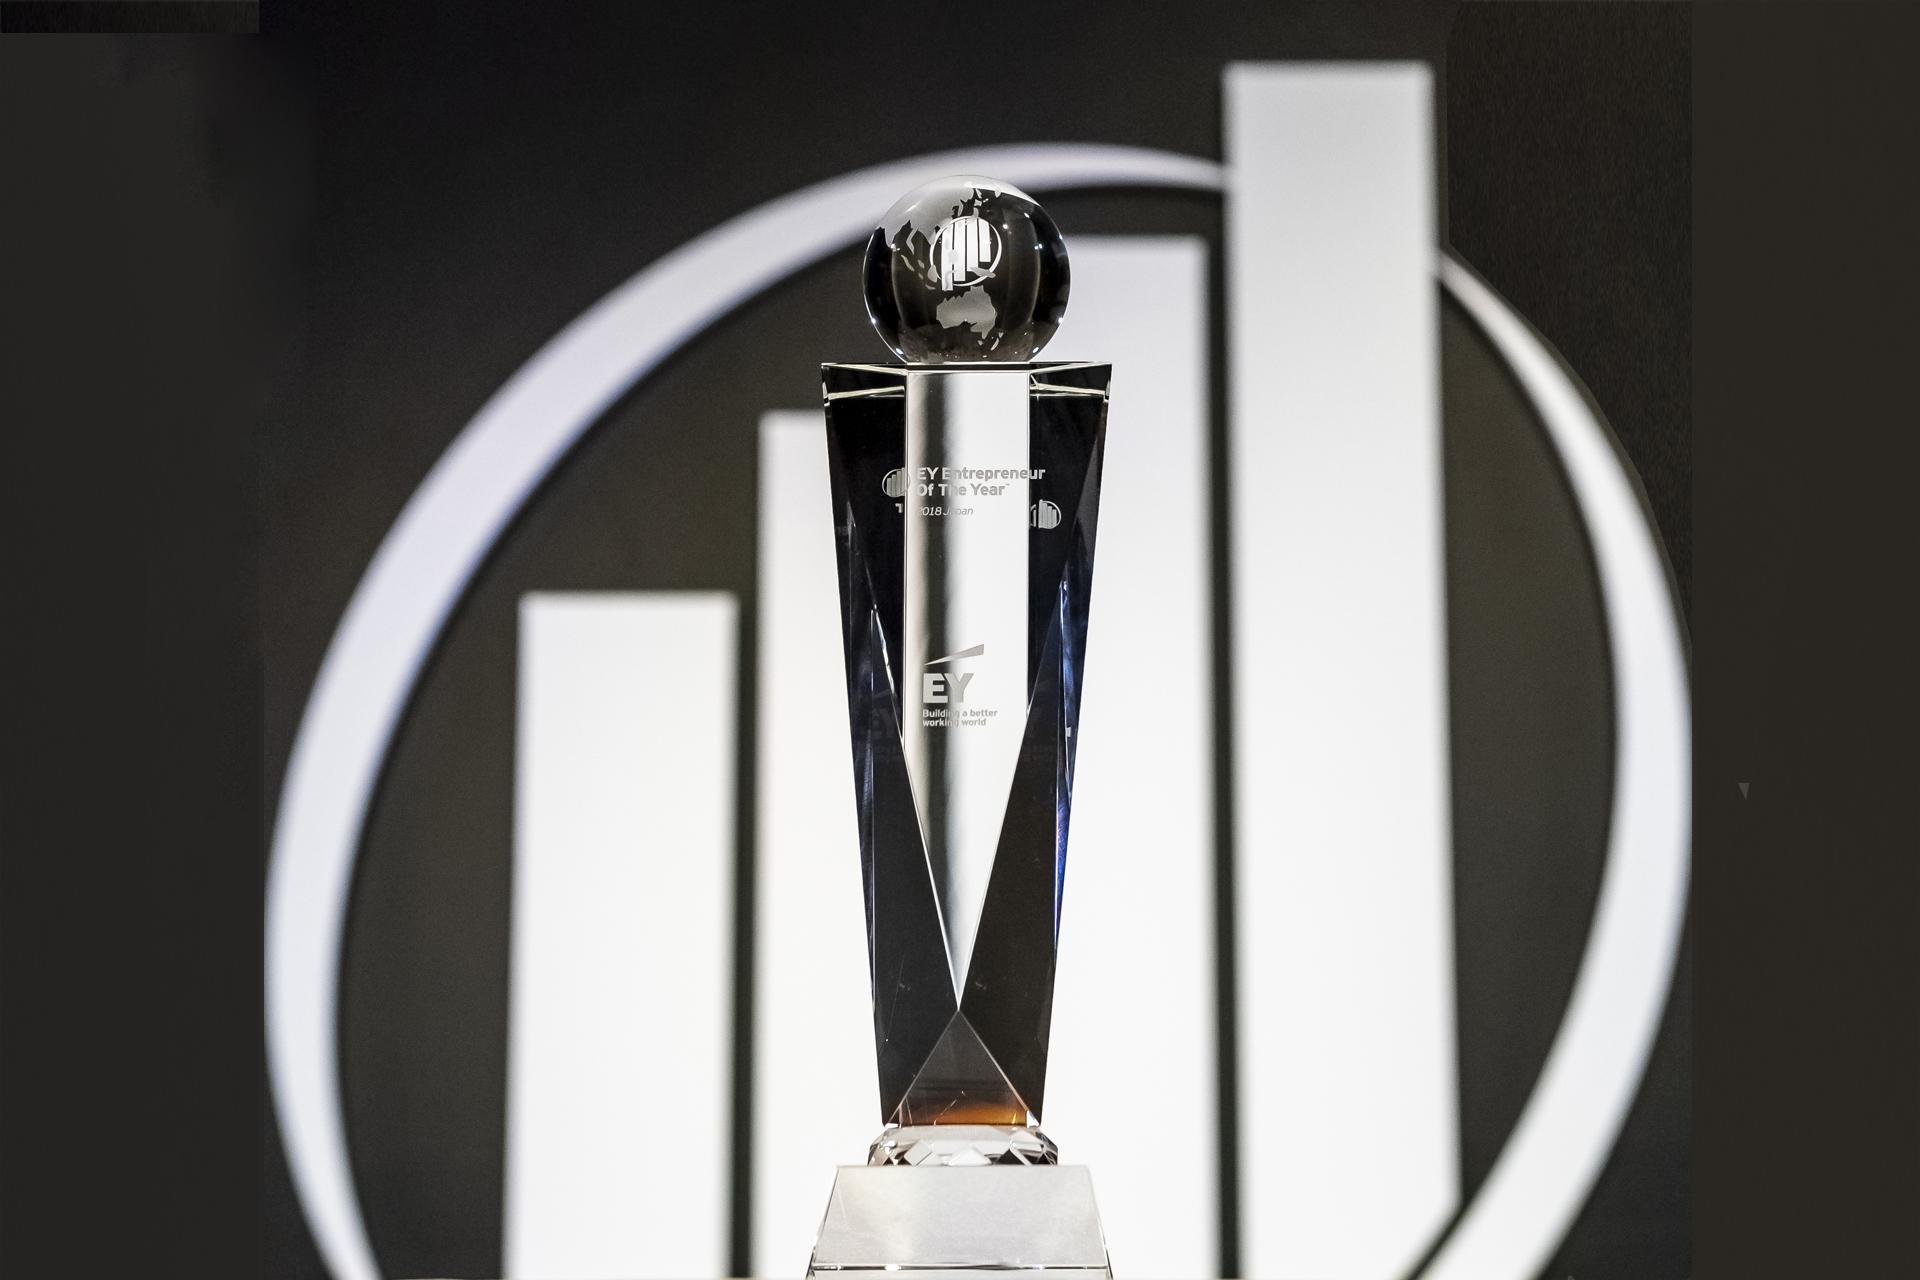 WEOY Award Fountain